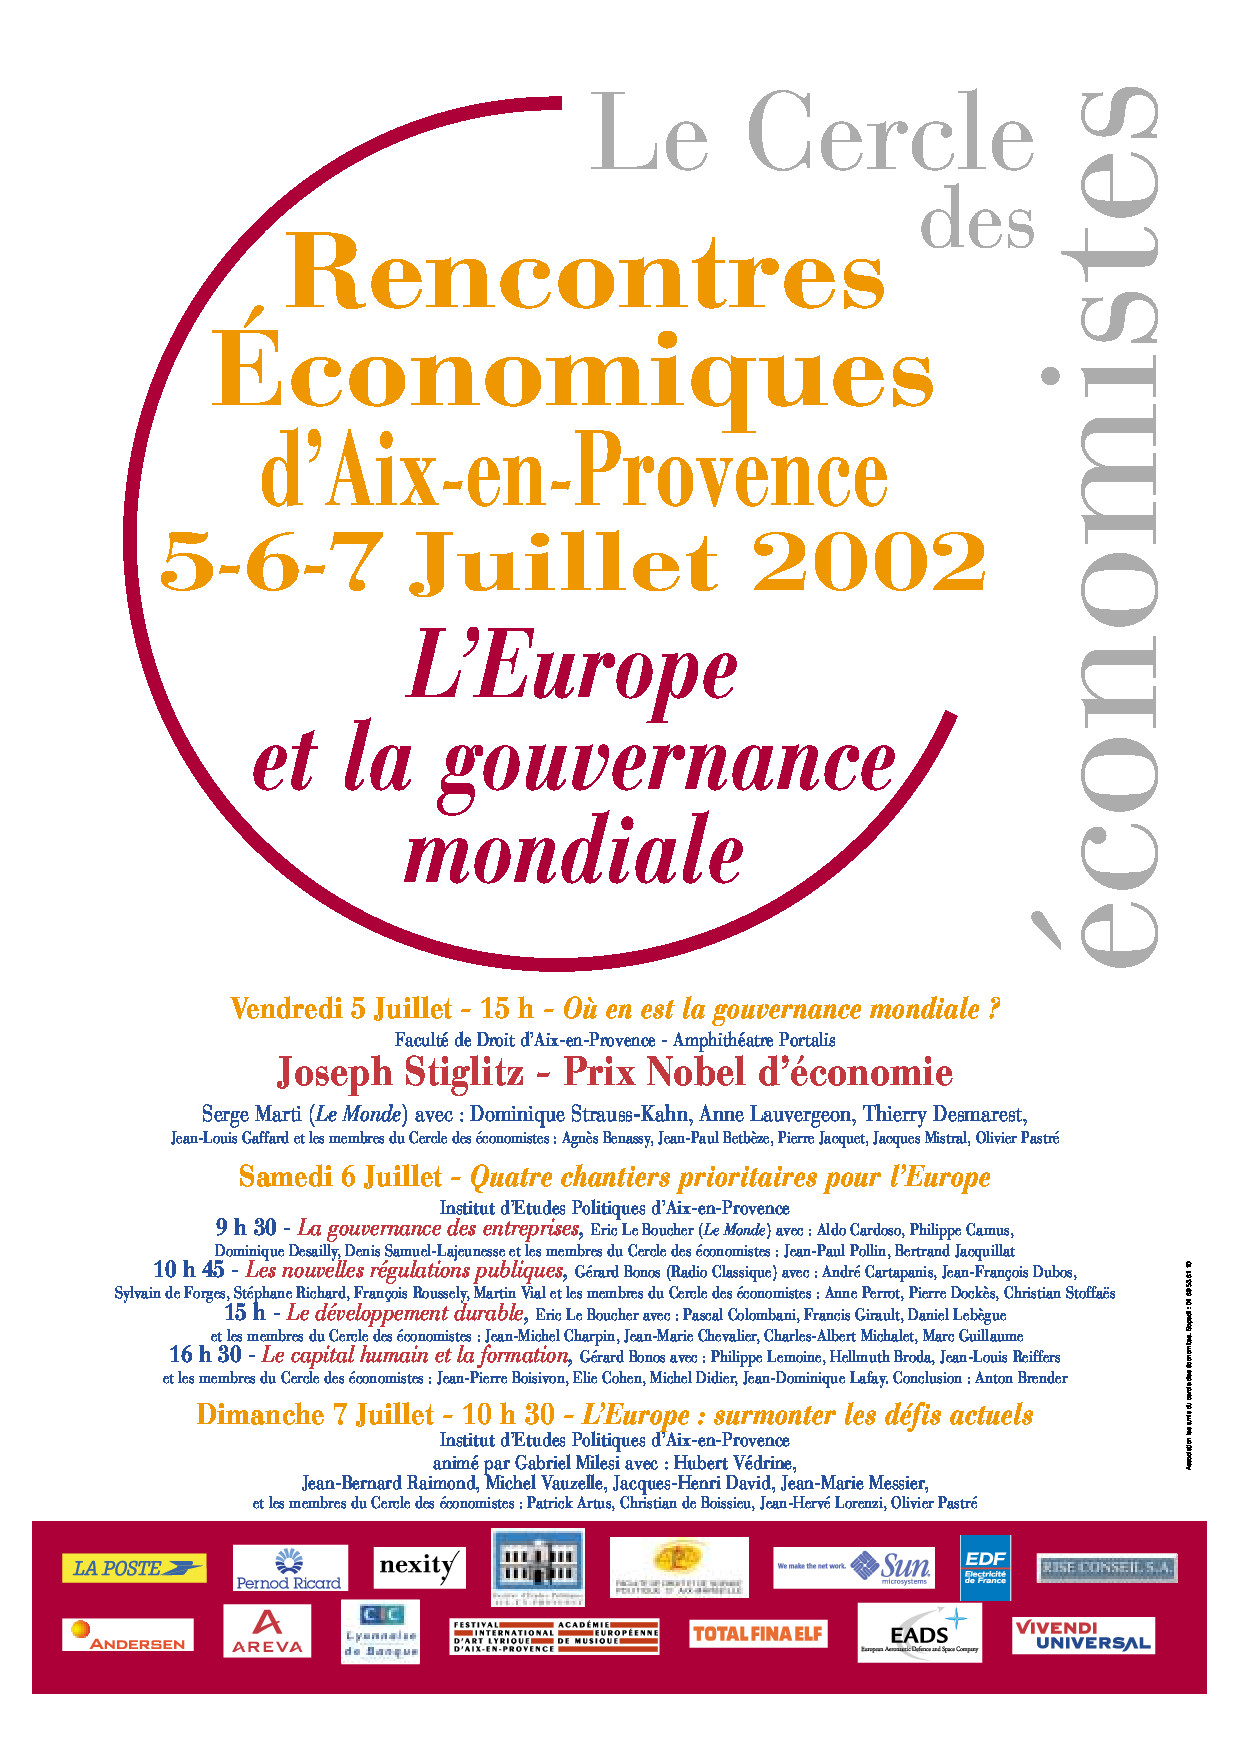 Rencontres economiques aix en provence